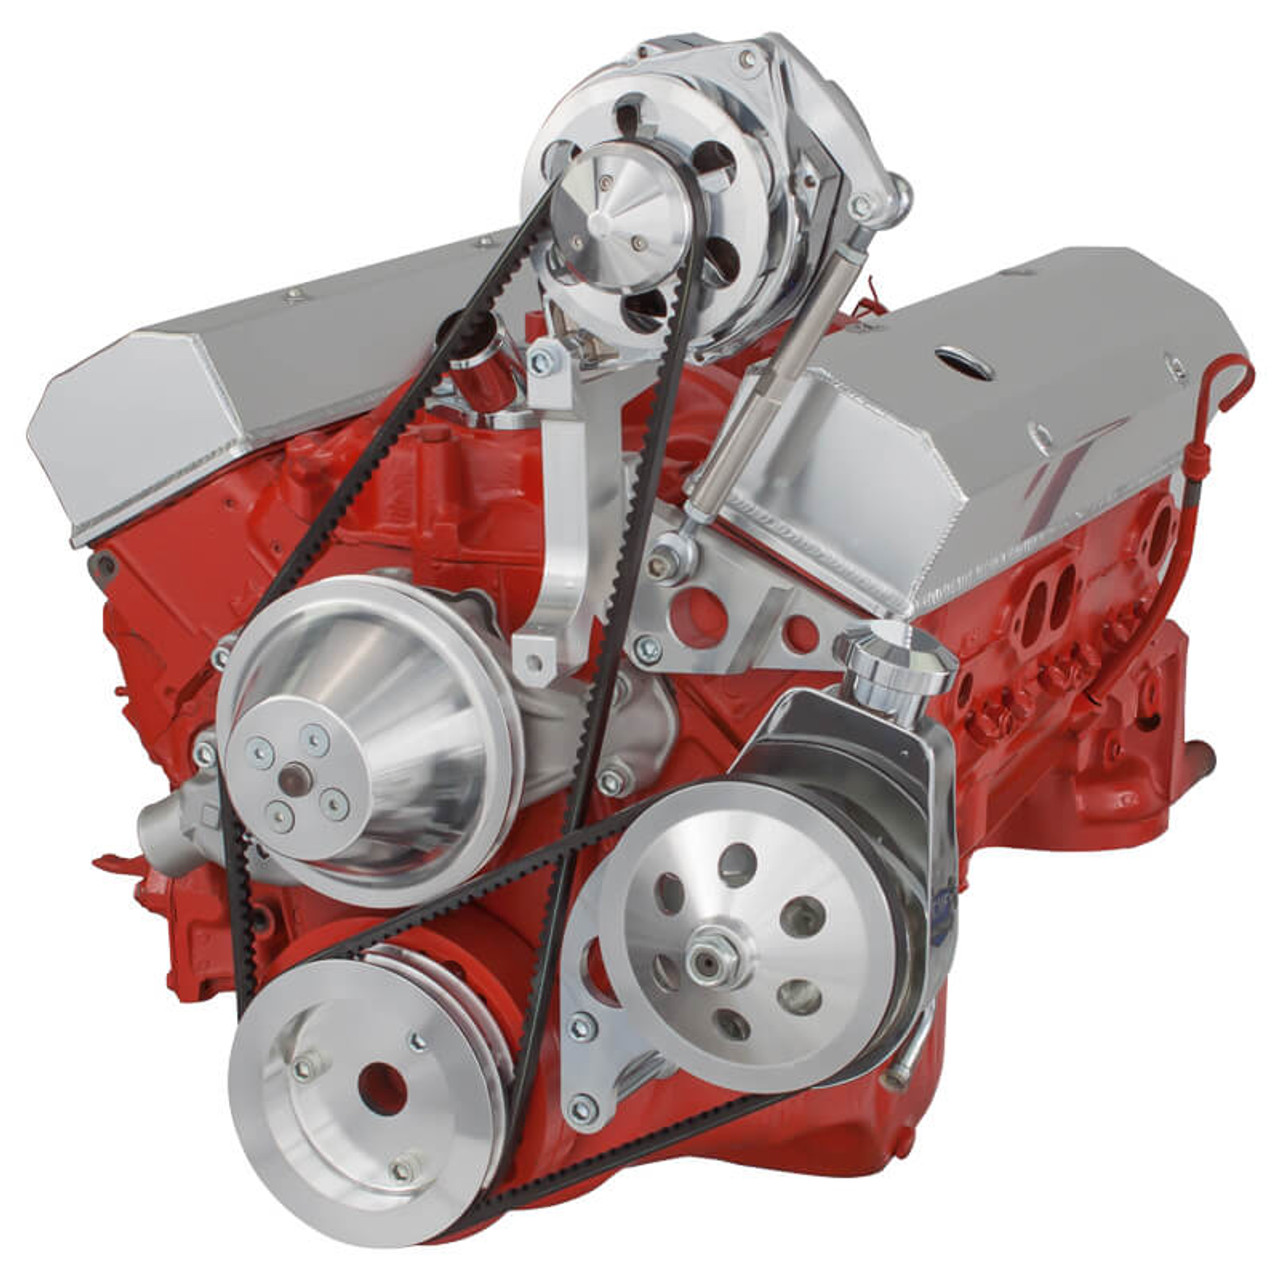 Chevy V-Belt Pulley & Bracket System: 302-305-350-400 SBCCVF Racing